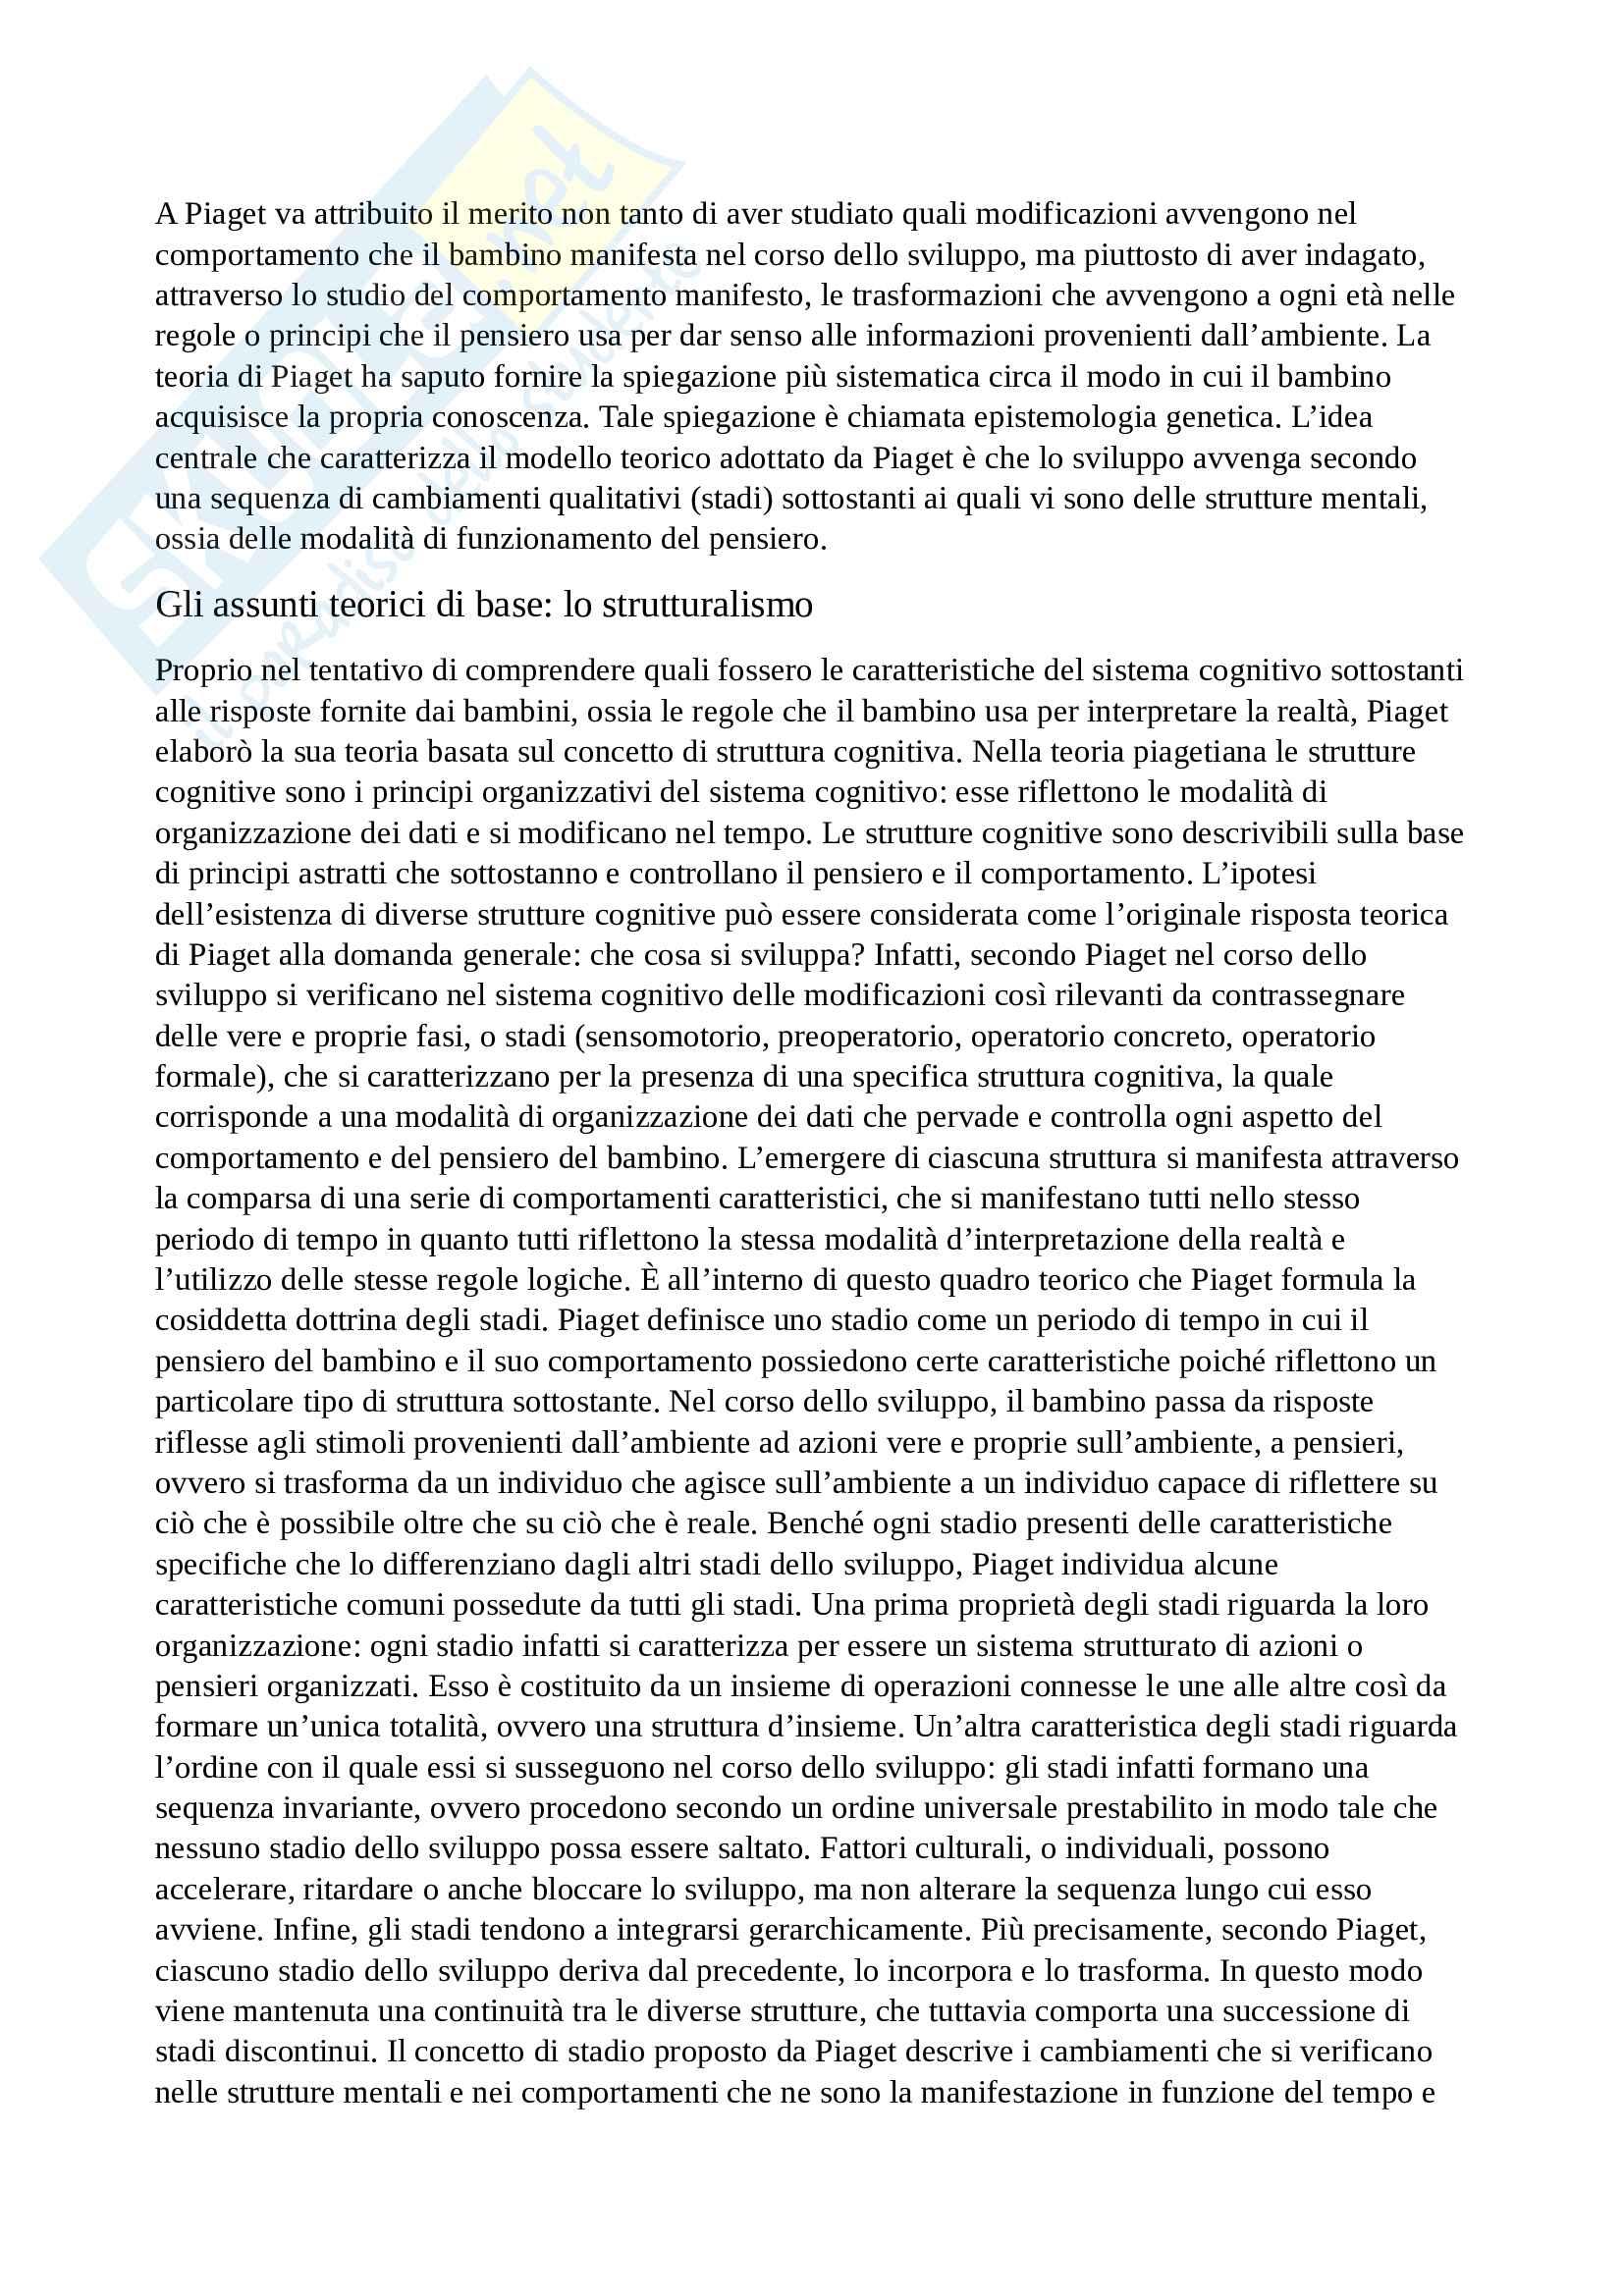 Psicologia dello Sviluppo: Piaget e Vygotskij